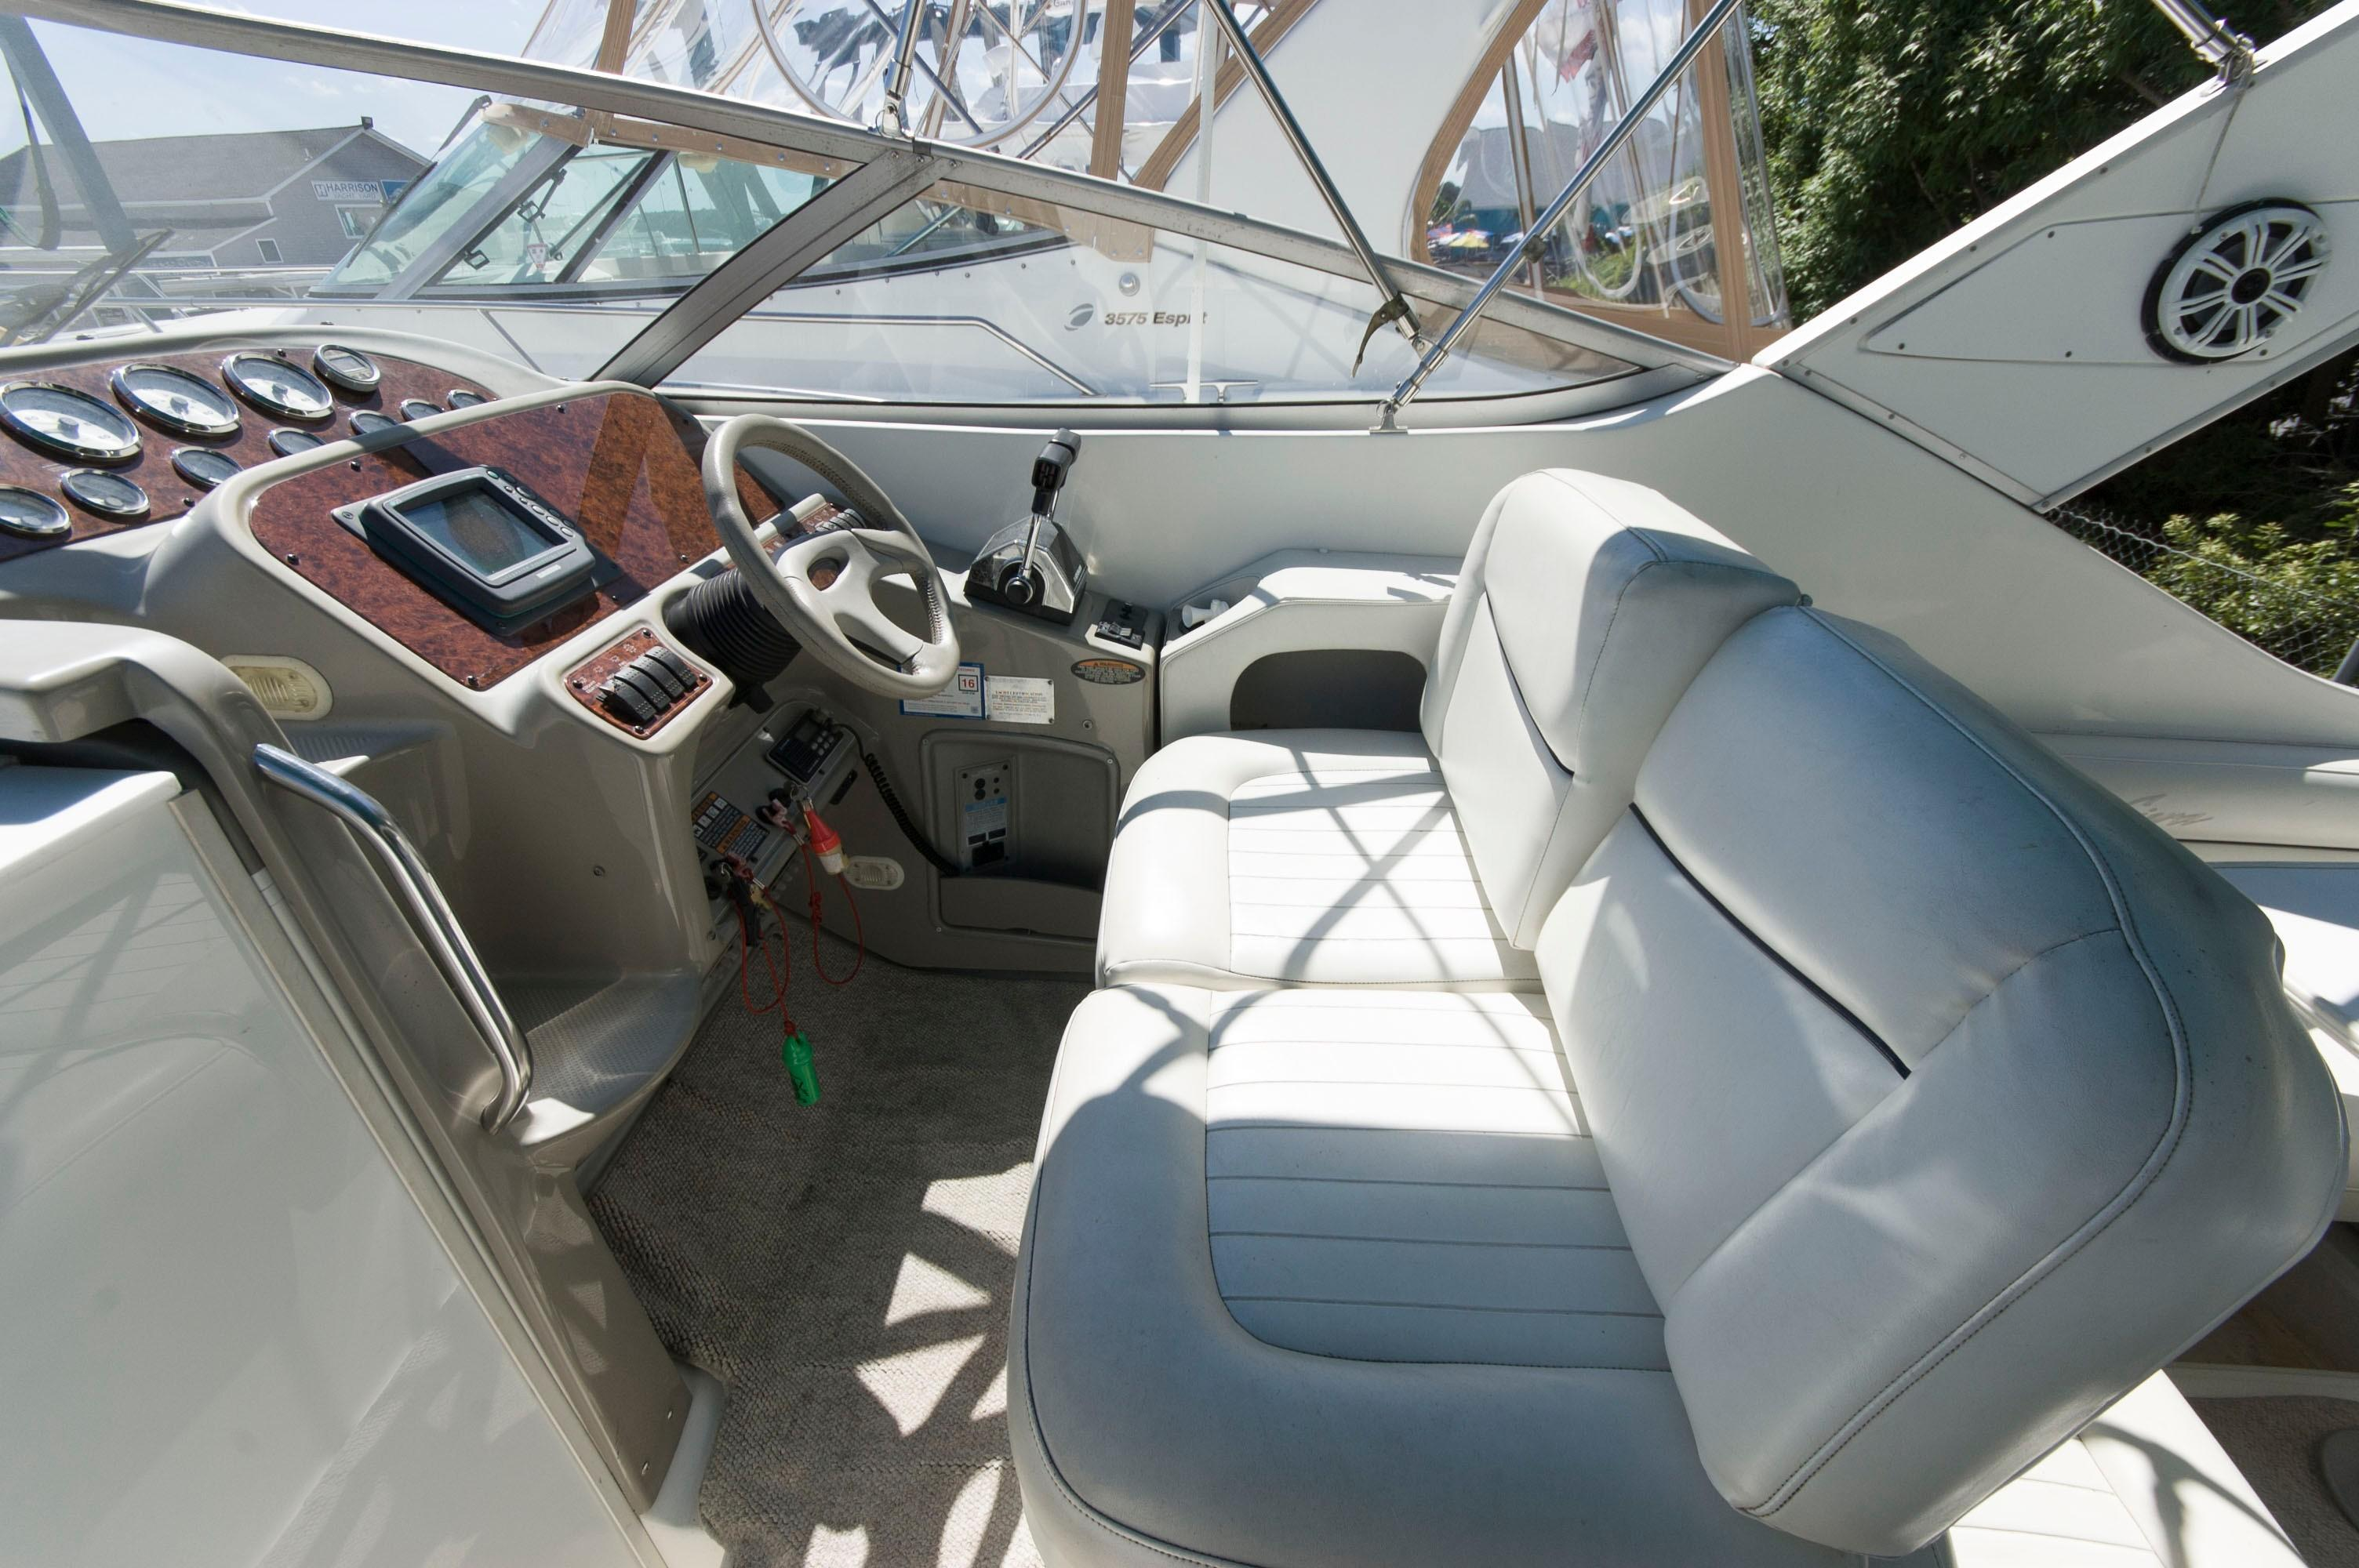 medium resolution of 1999 bayliner 3055 ciera power boat for sale www yachtworld com mako wiring diagram bayliner 3055 wiring diagram